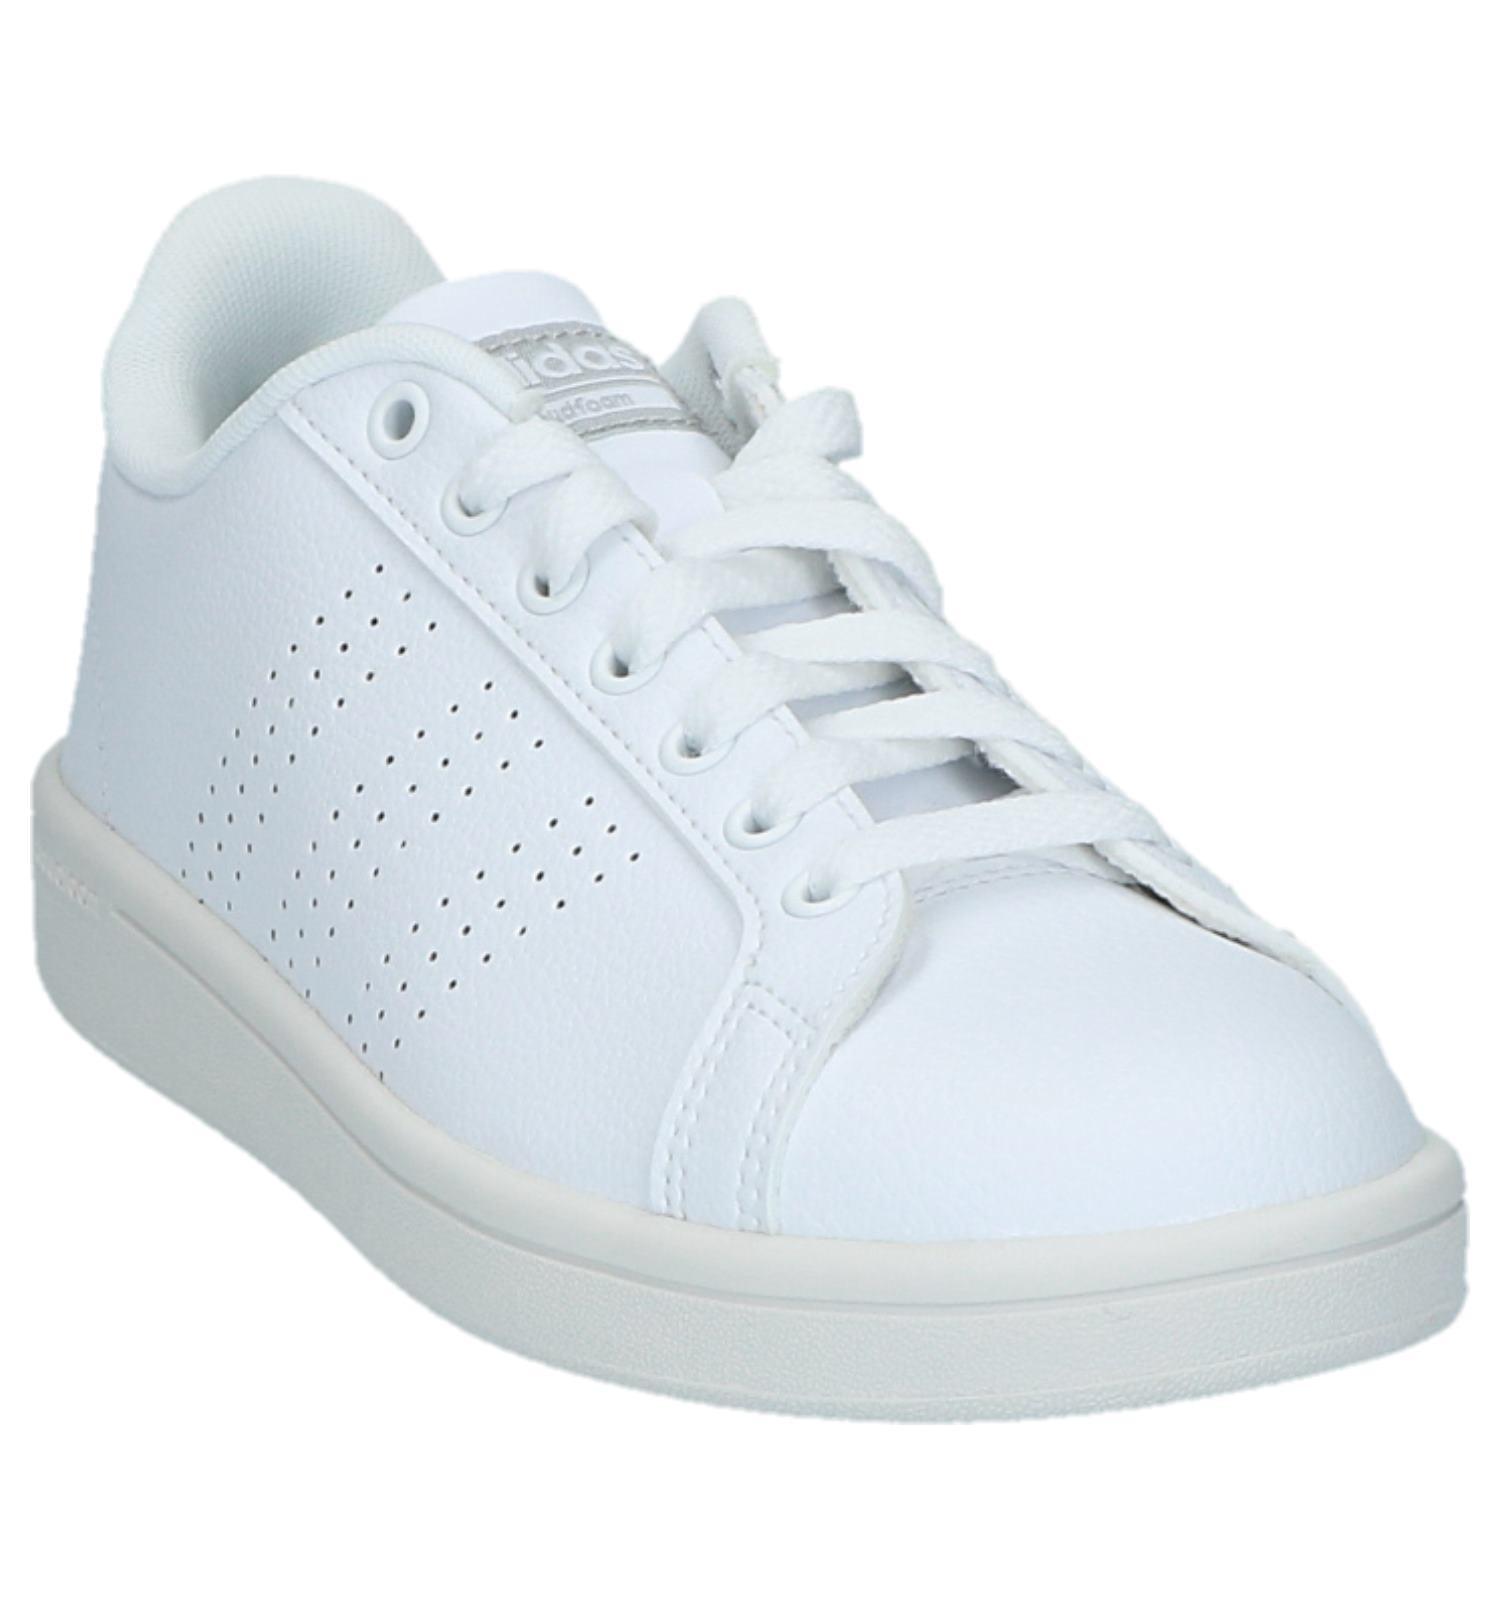 Adidas Cf Lage Sportieve Witte Advantage Sneakers Clean SMqzVUpG